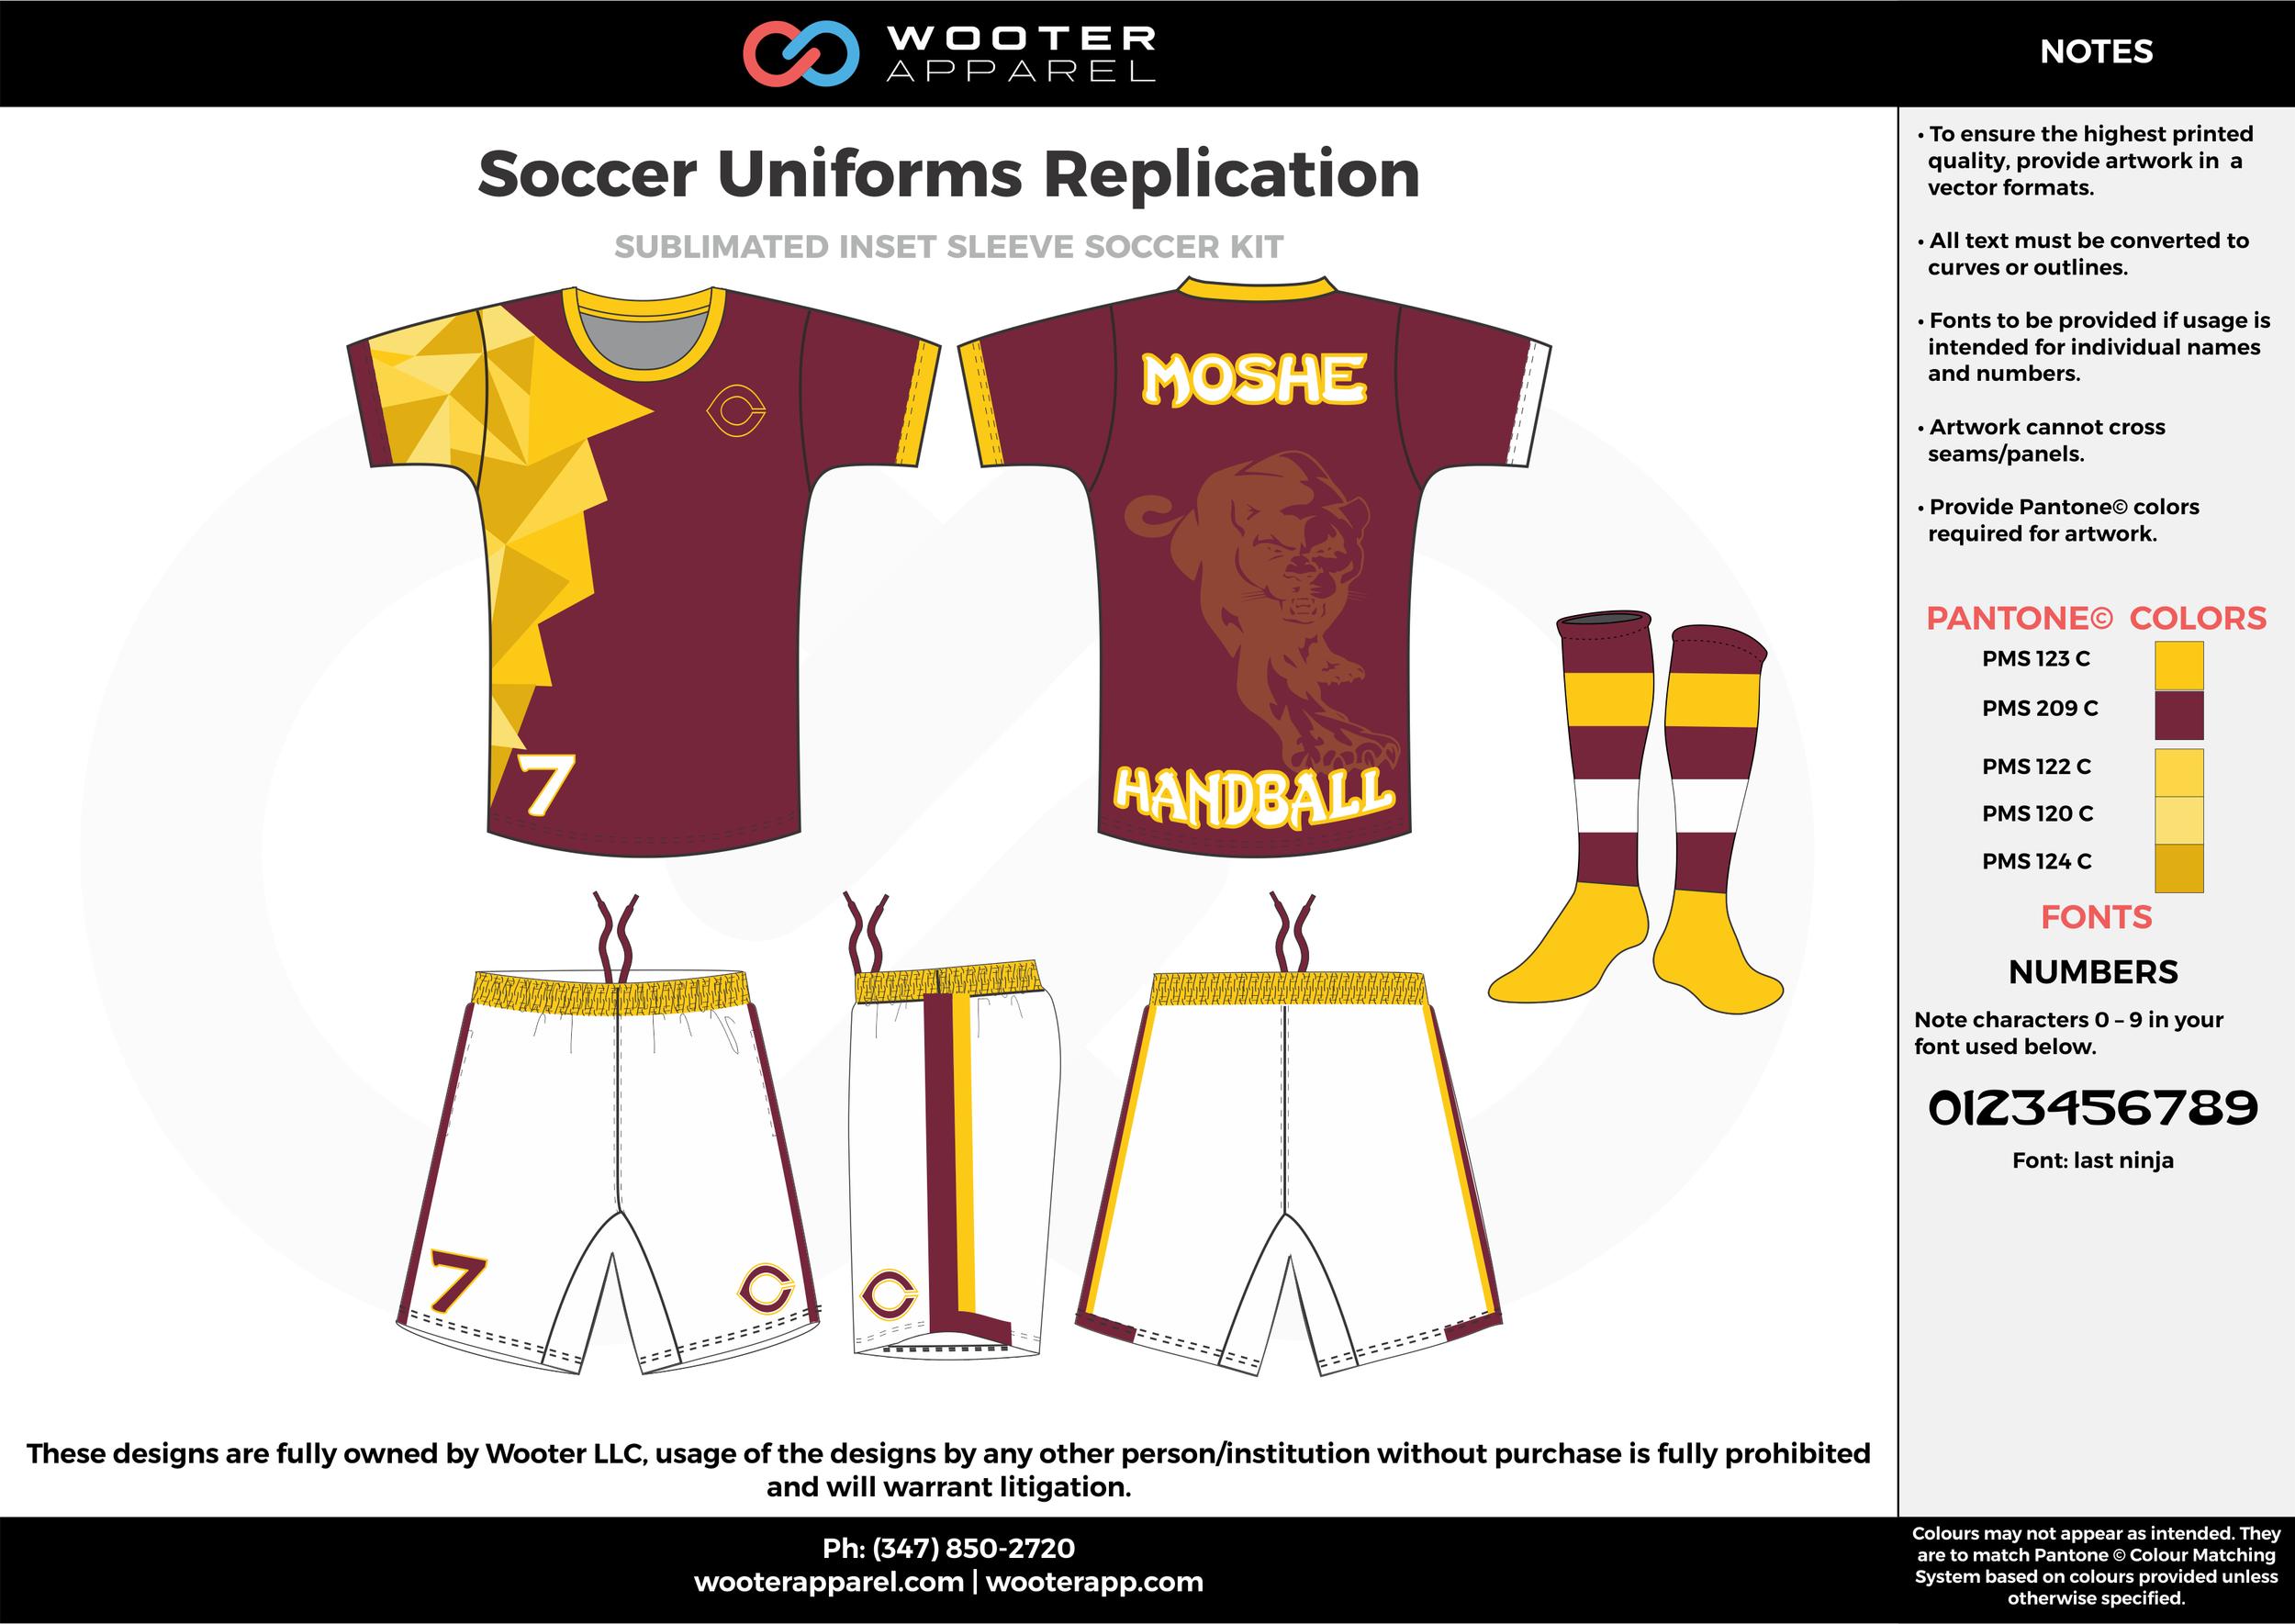 Soccer Uniforms Replication maroon yellow custom sublimated soccer uniform jersey shirt shorts socks